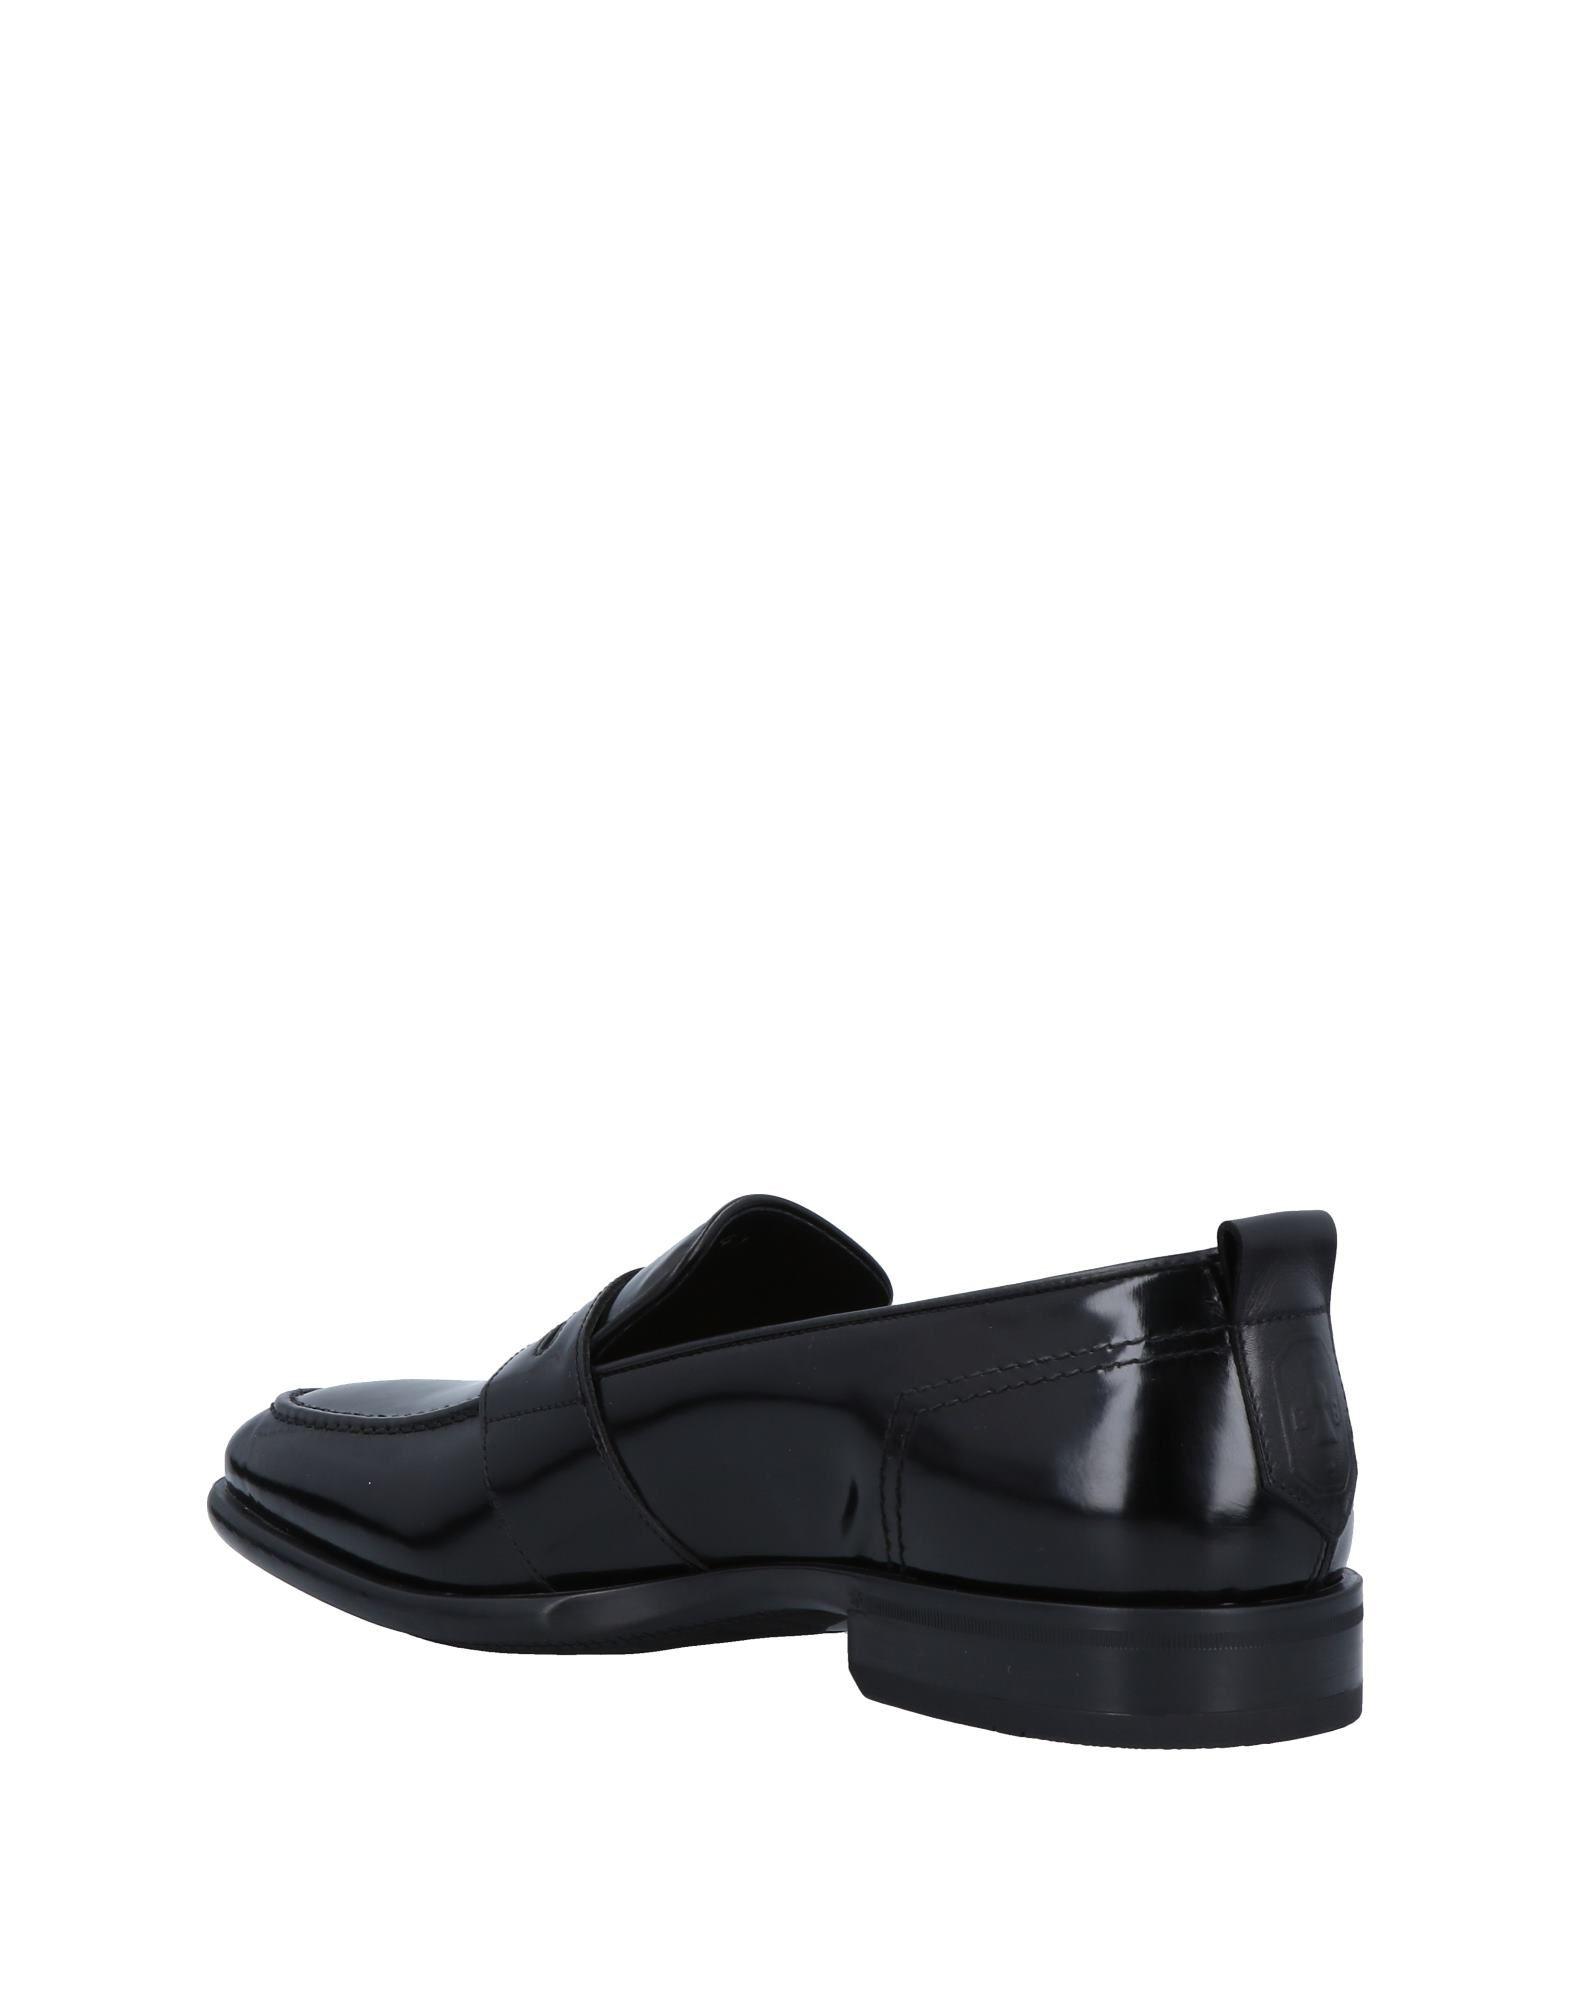 Bruno Bordese Mokassins Herren  11522892KS Gute Qualität beliebte Schuhe